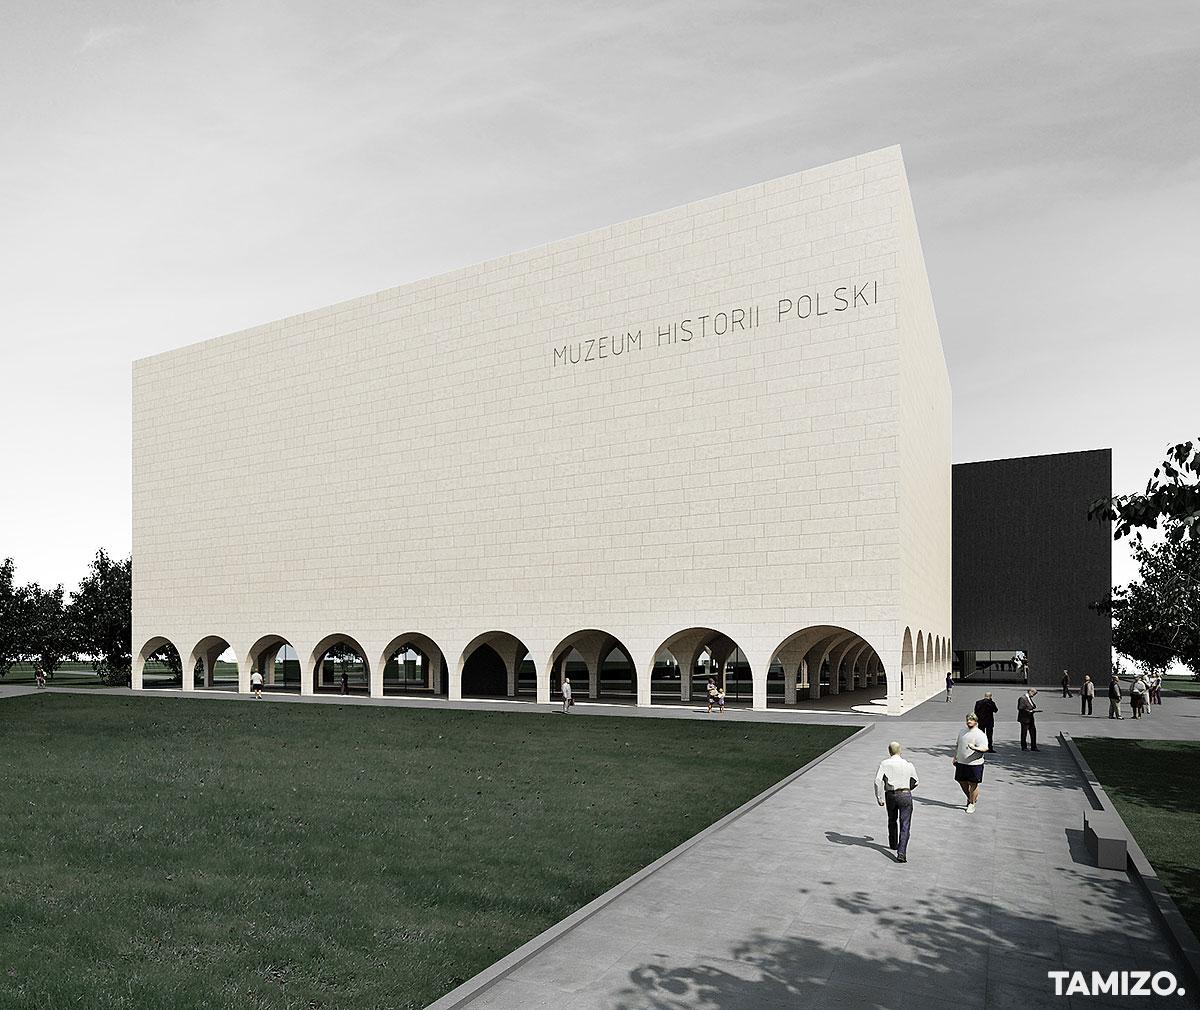 A037_tamizo_architekci_projekt_konkurs_muzeum_historii_polski_03